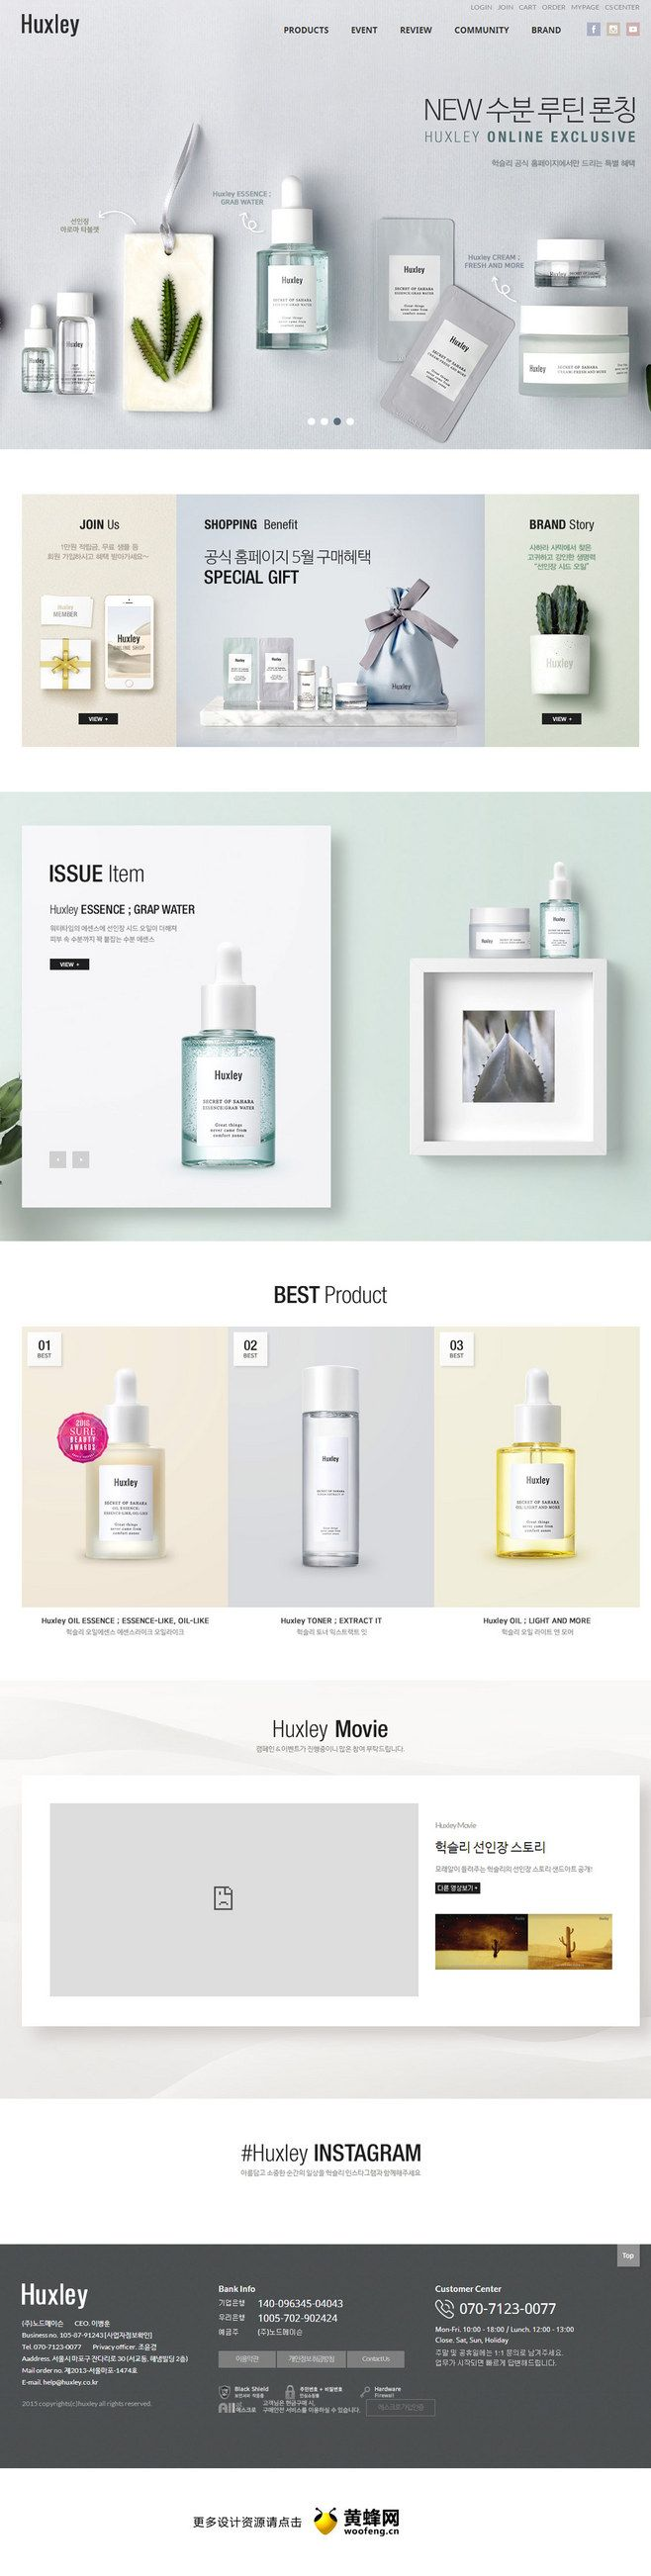 huxley化妆品网站,来源自黄蜂网ht...